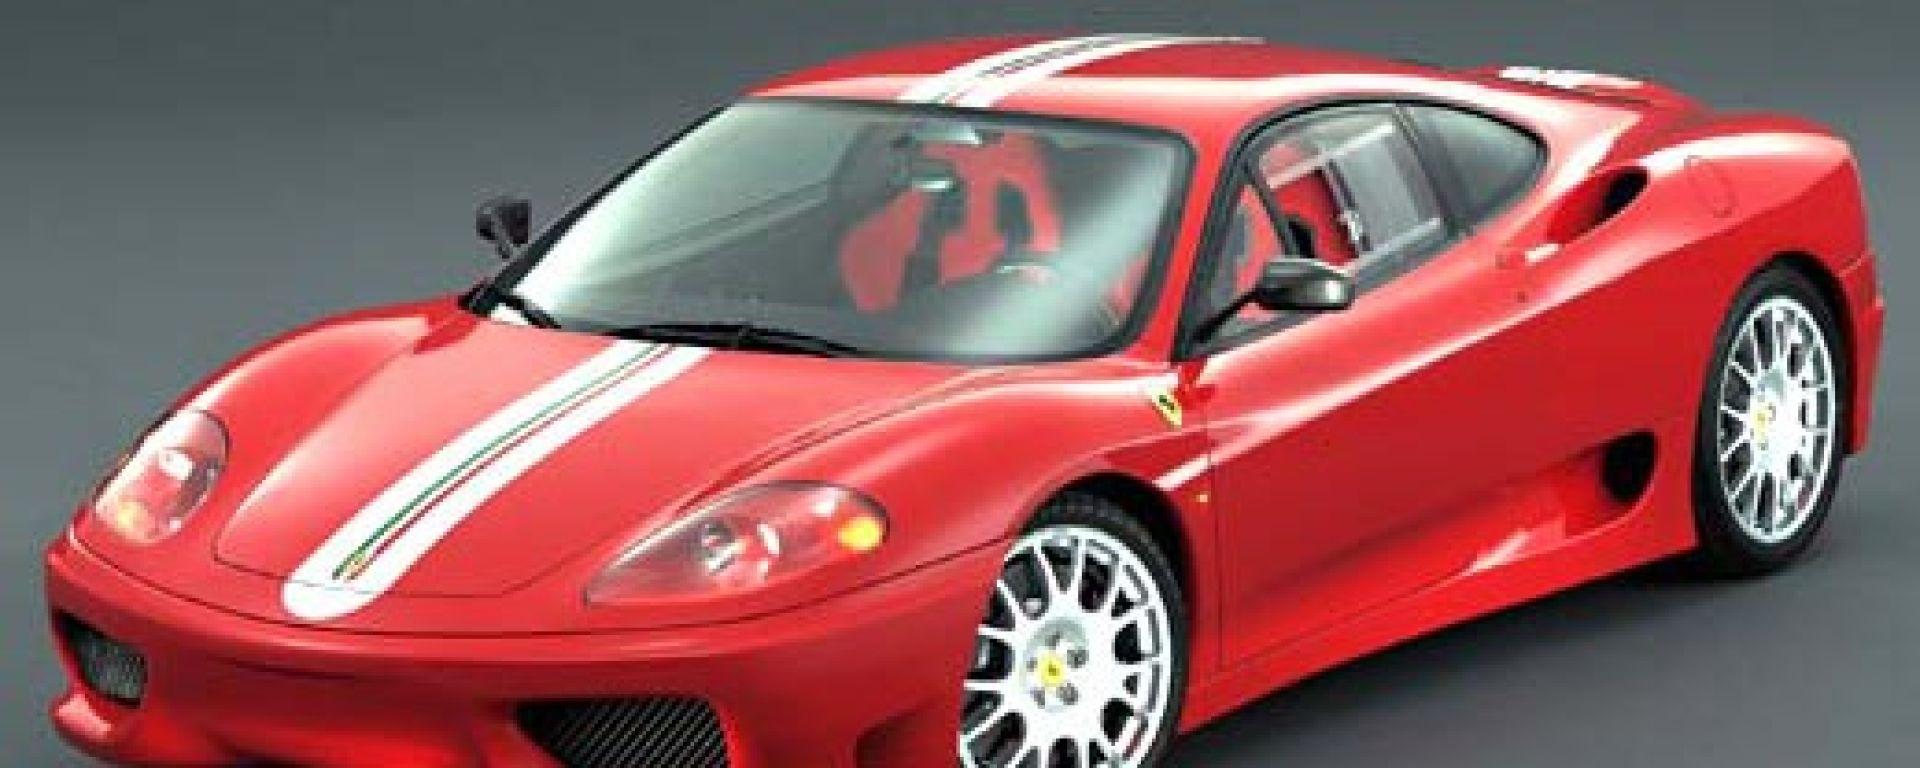 Anteprima: Ferrari Challenge Stradale